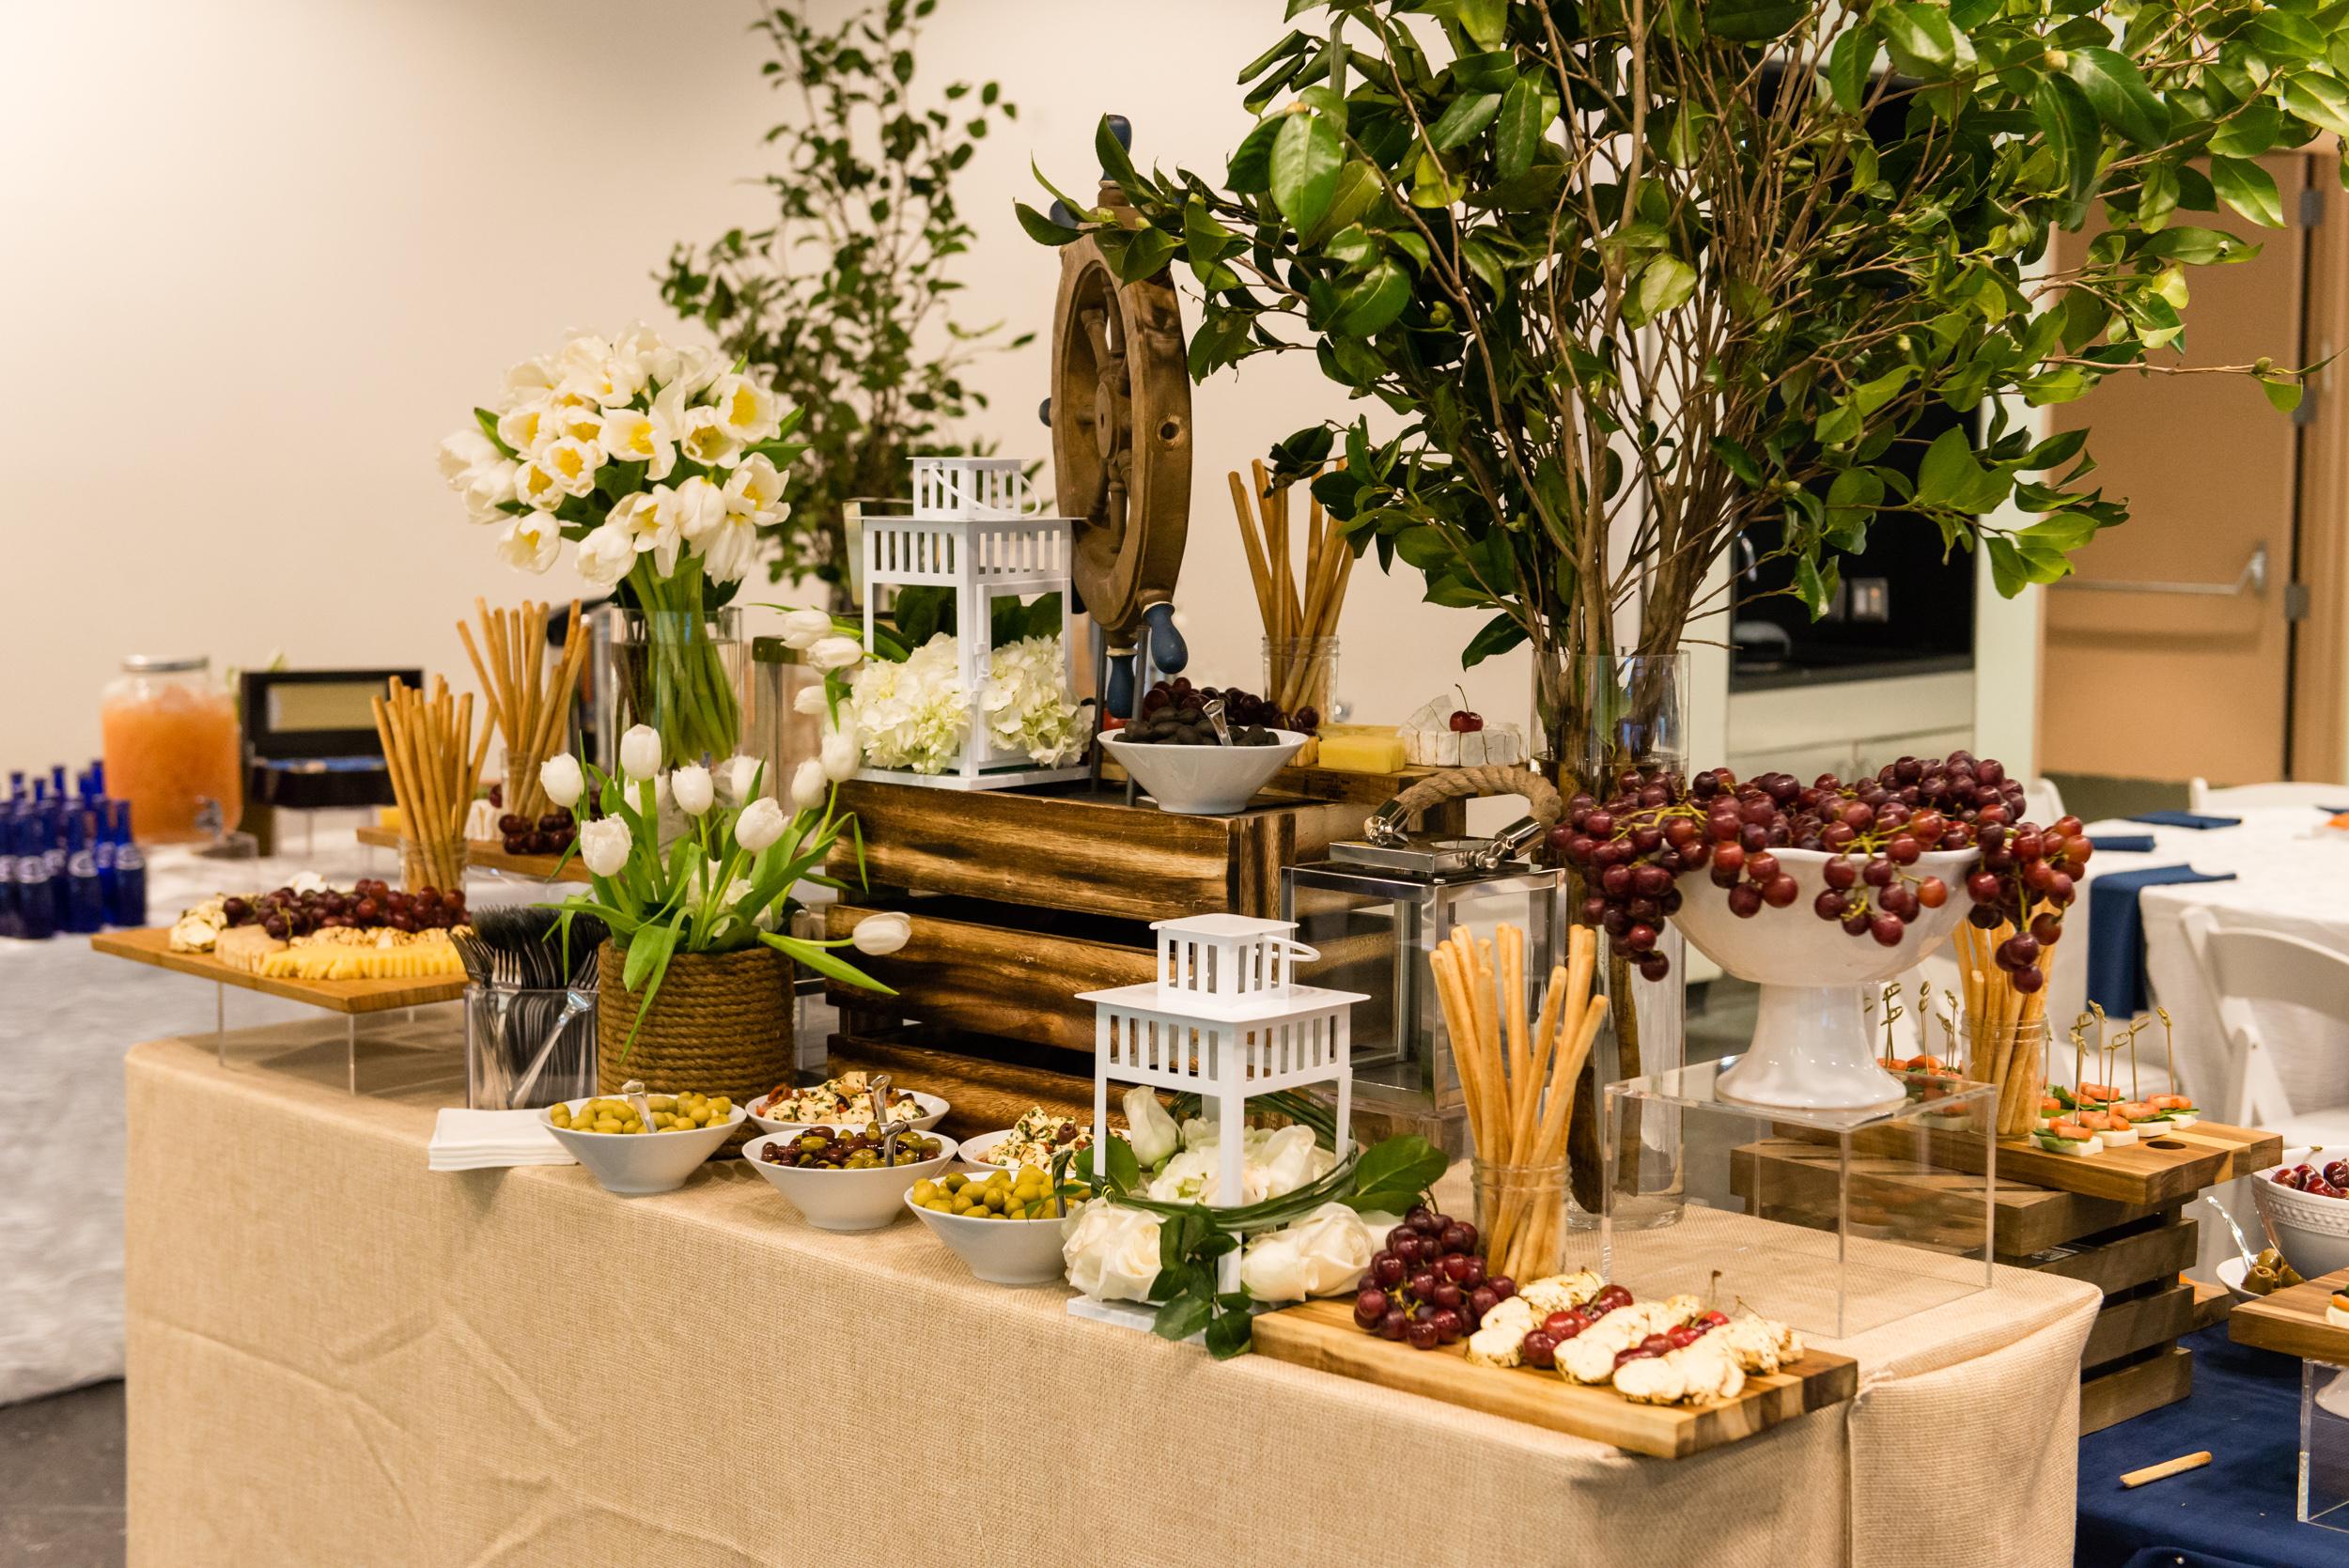 2017_01_06_Chani Greenbaum Catering Set up Shots_DSC_8716.jpg